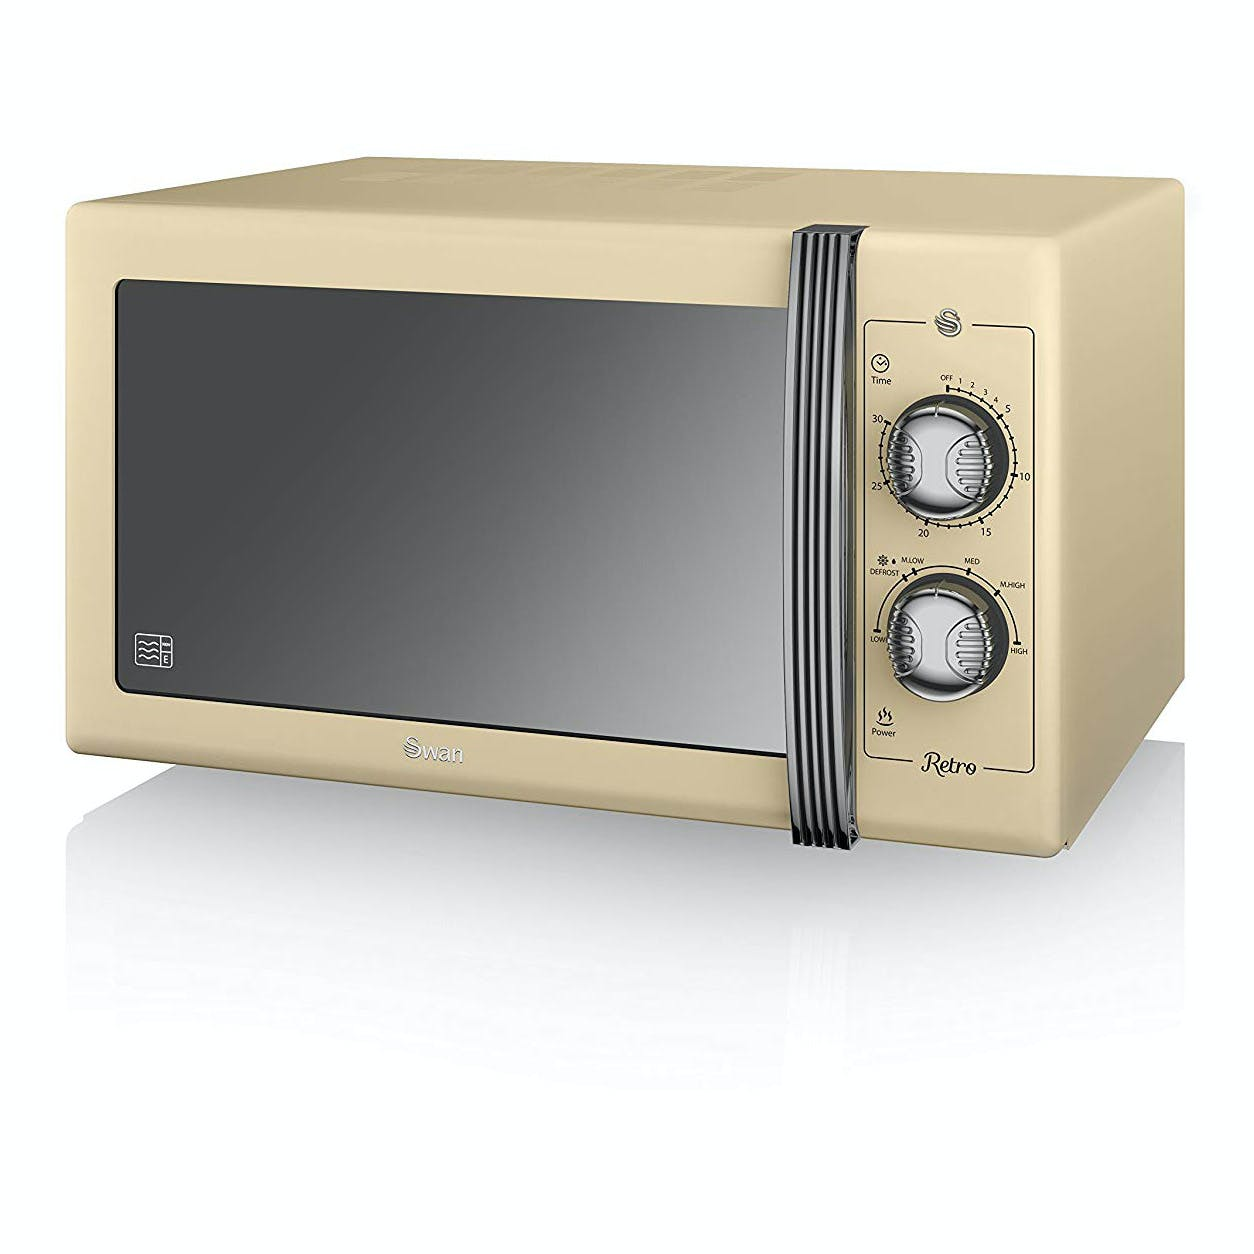 swan sm22070cn retro style microwave oven in cream 25 litre 900w